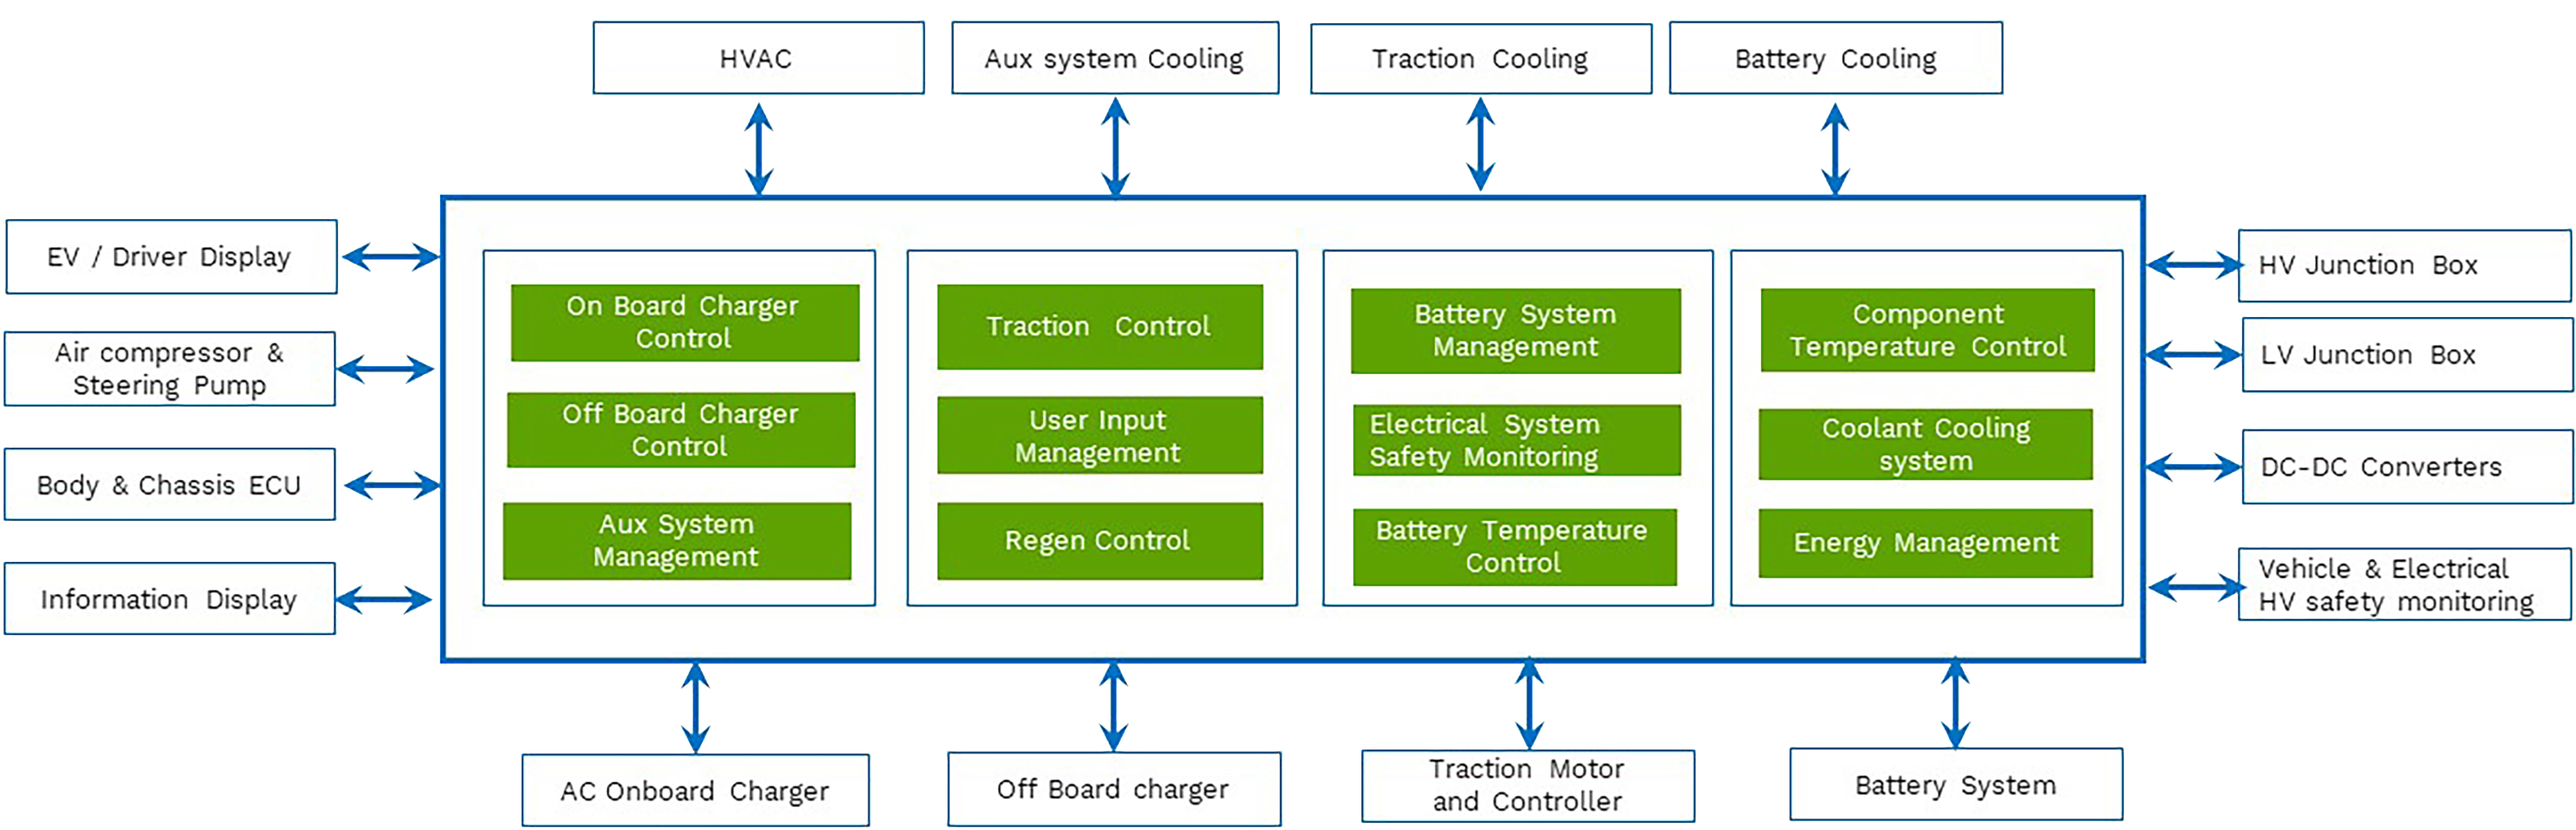 EA & typical key components